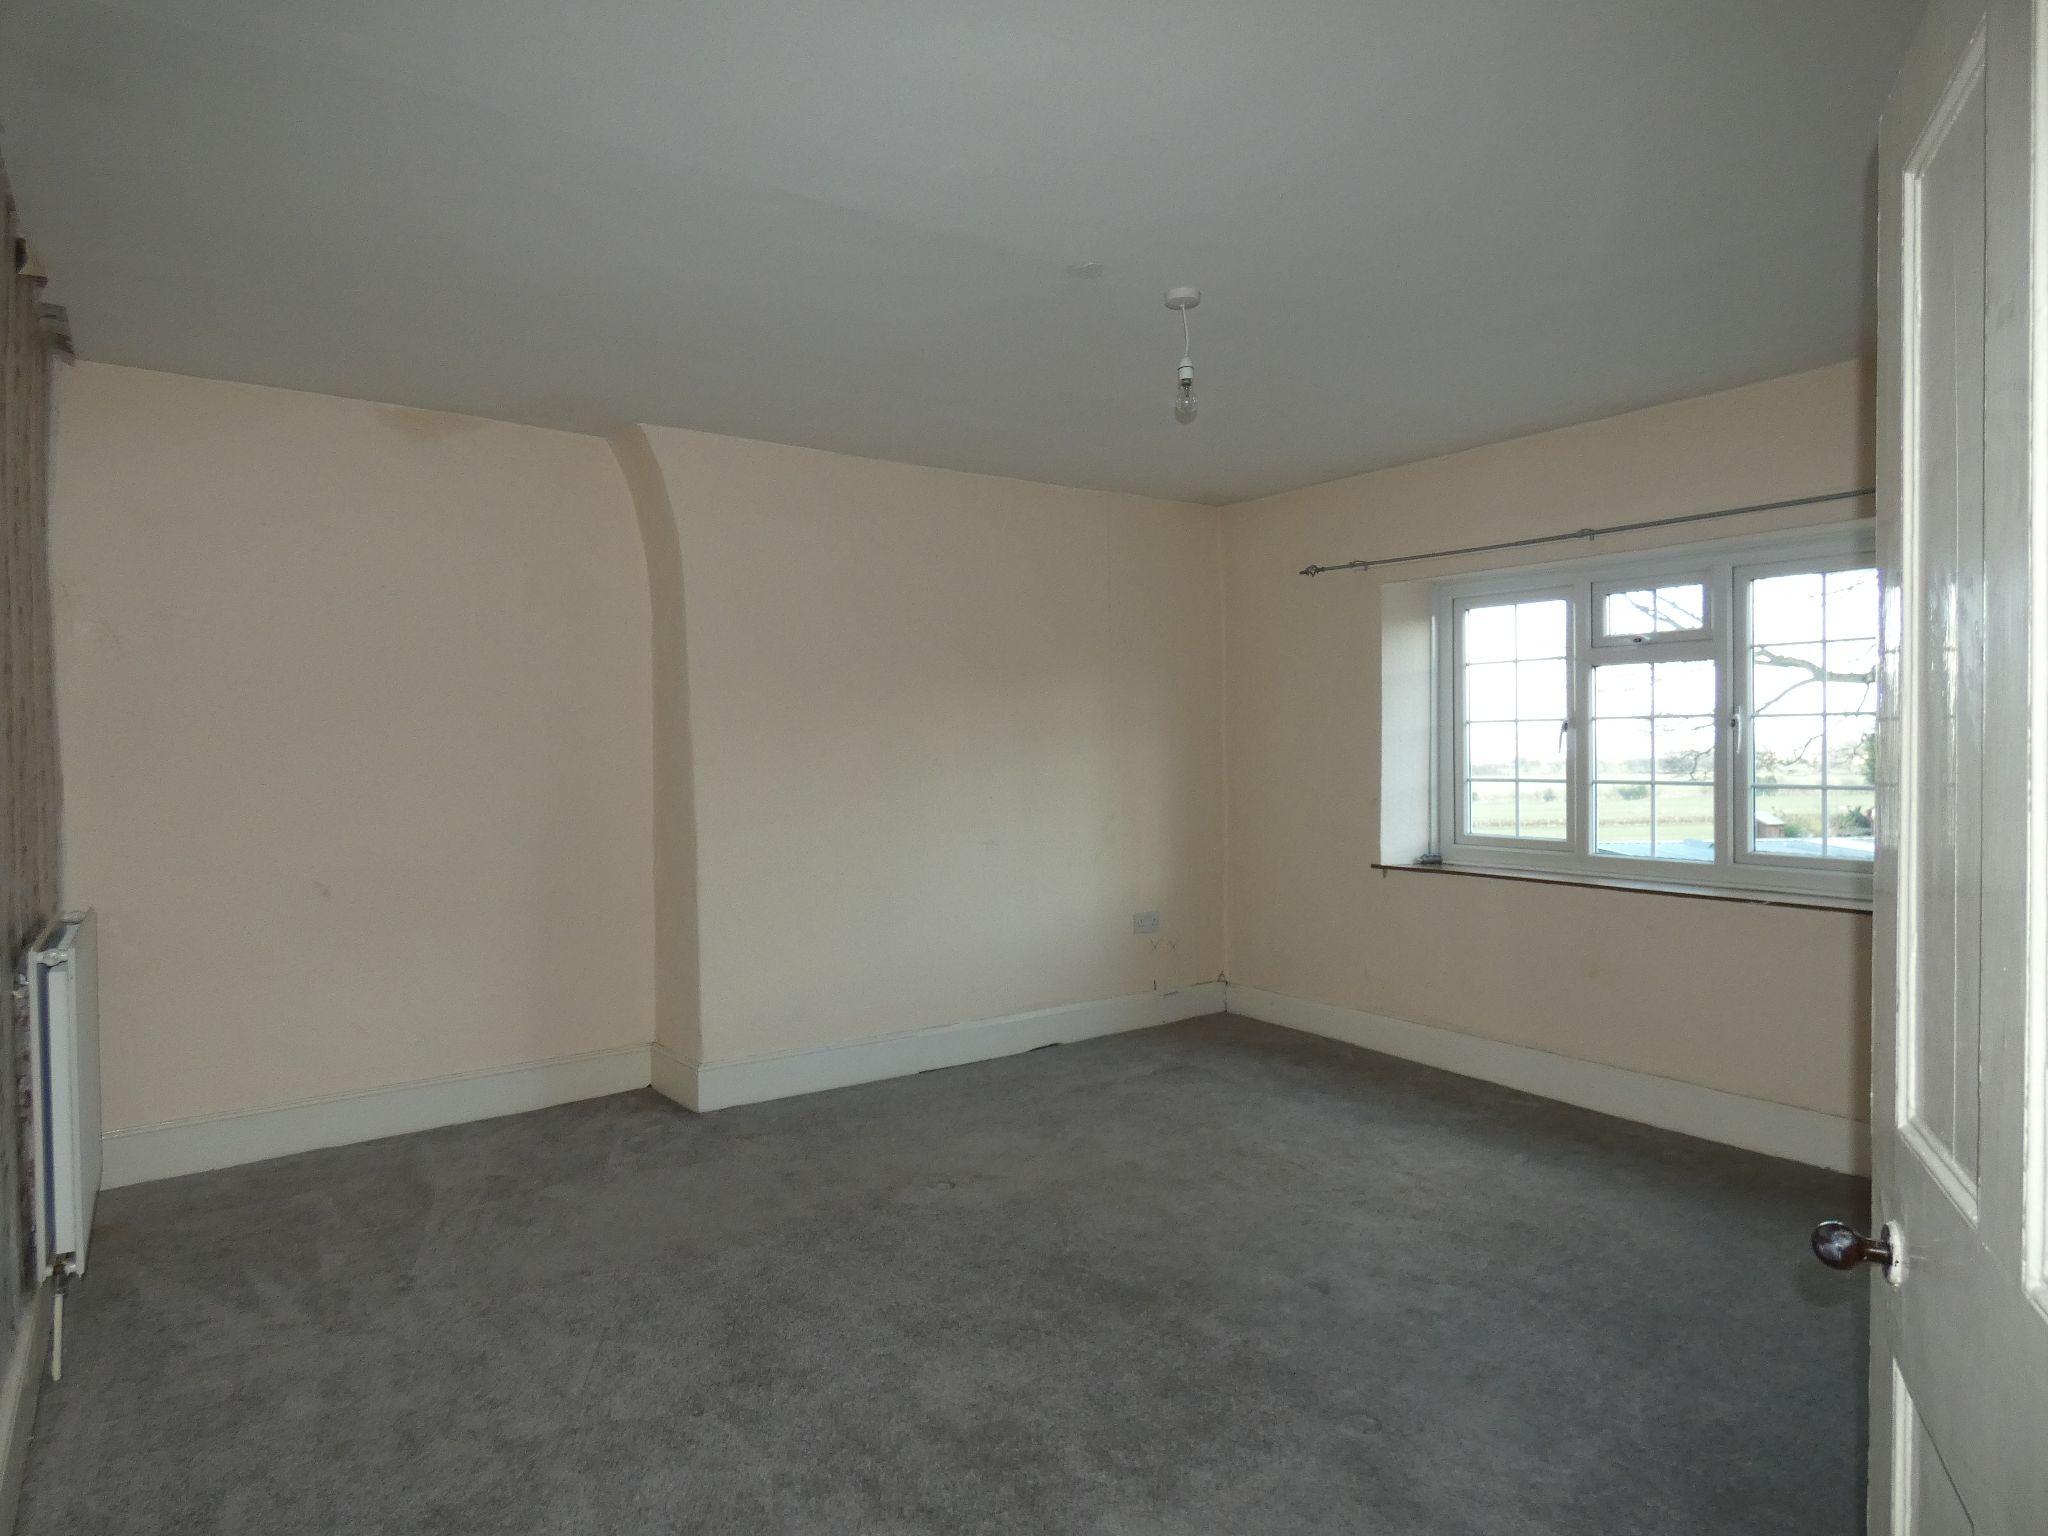 2 bedroom mid terraced house For Sale in Bishop Auckland - Bedroom One.